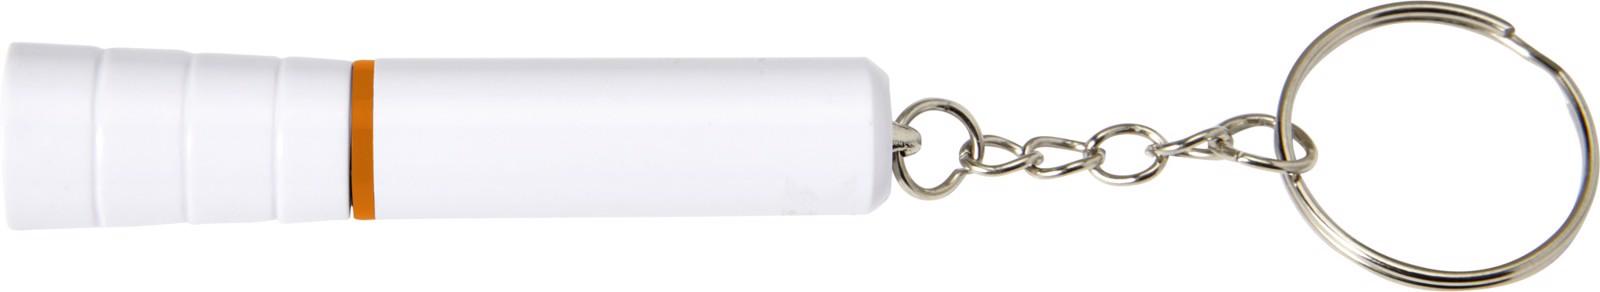 ABS key holder - Orange